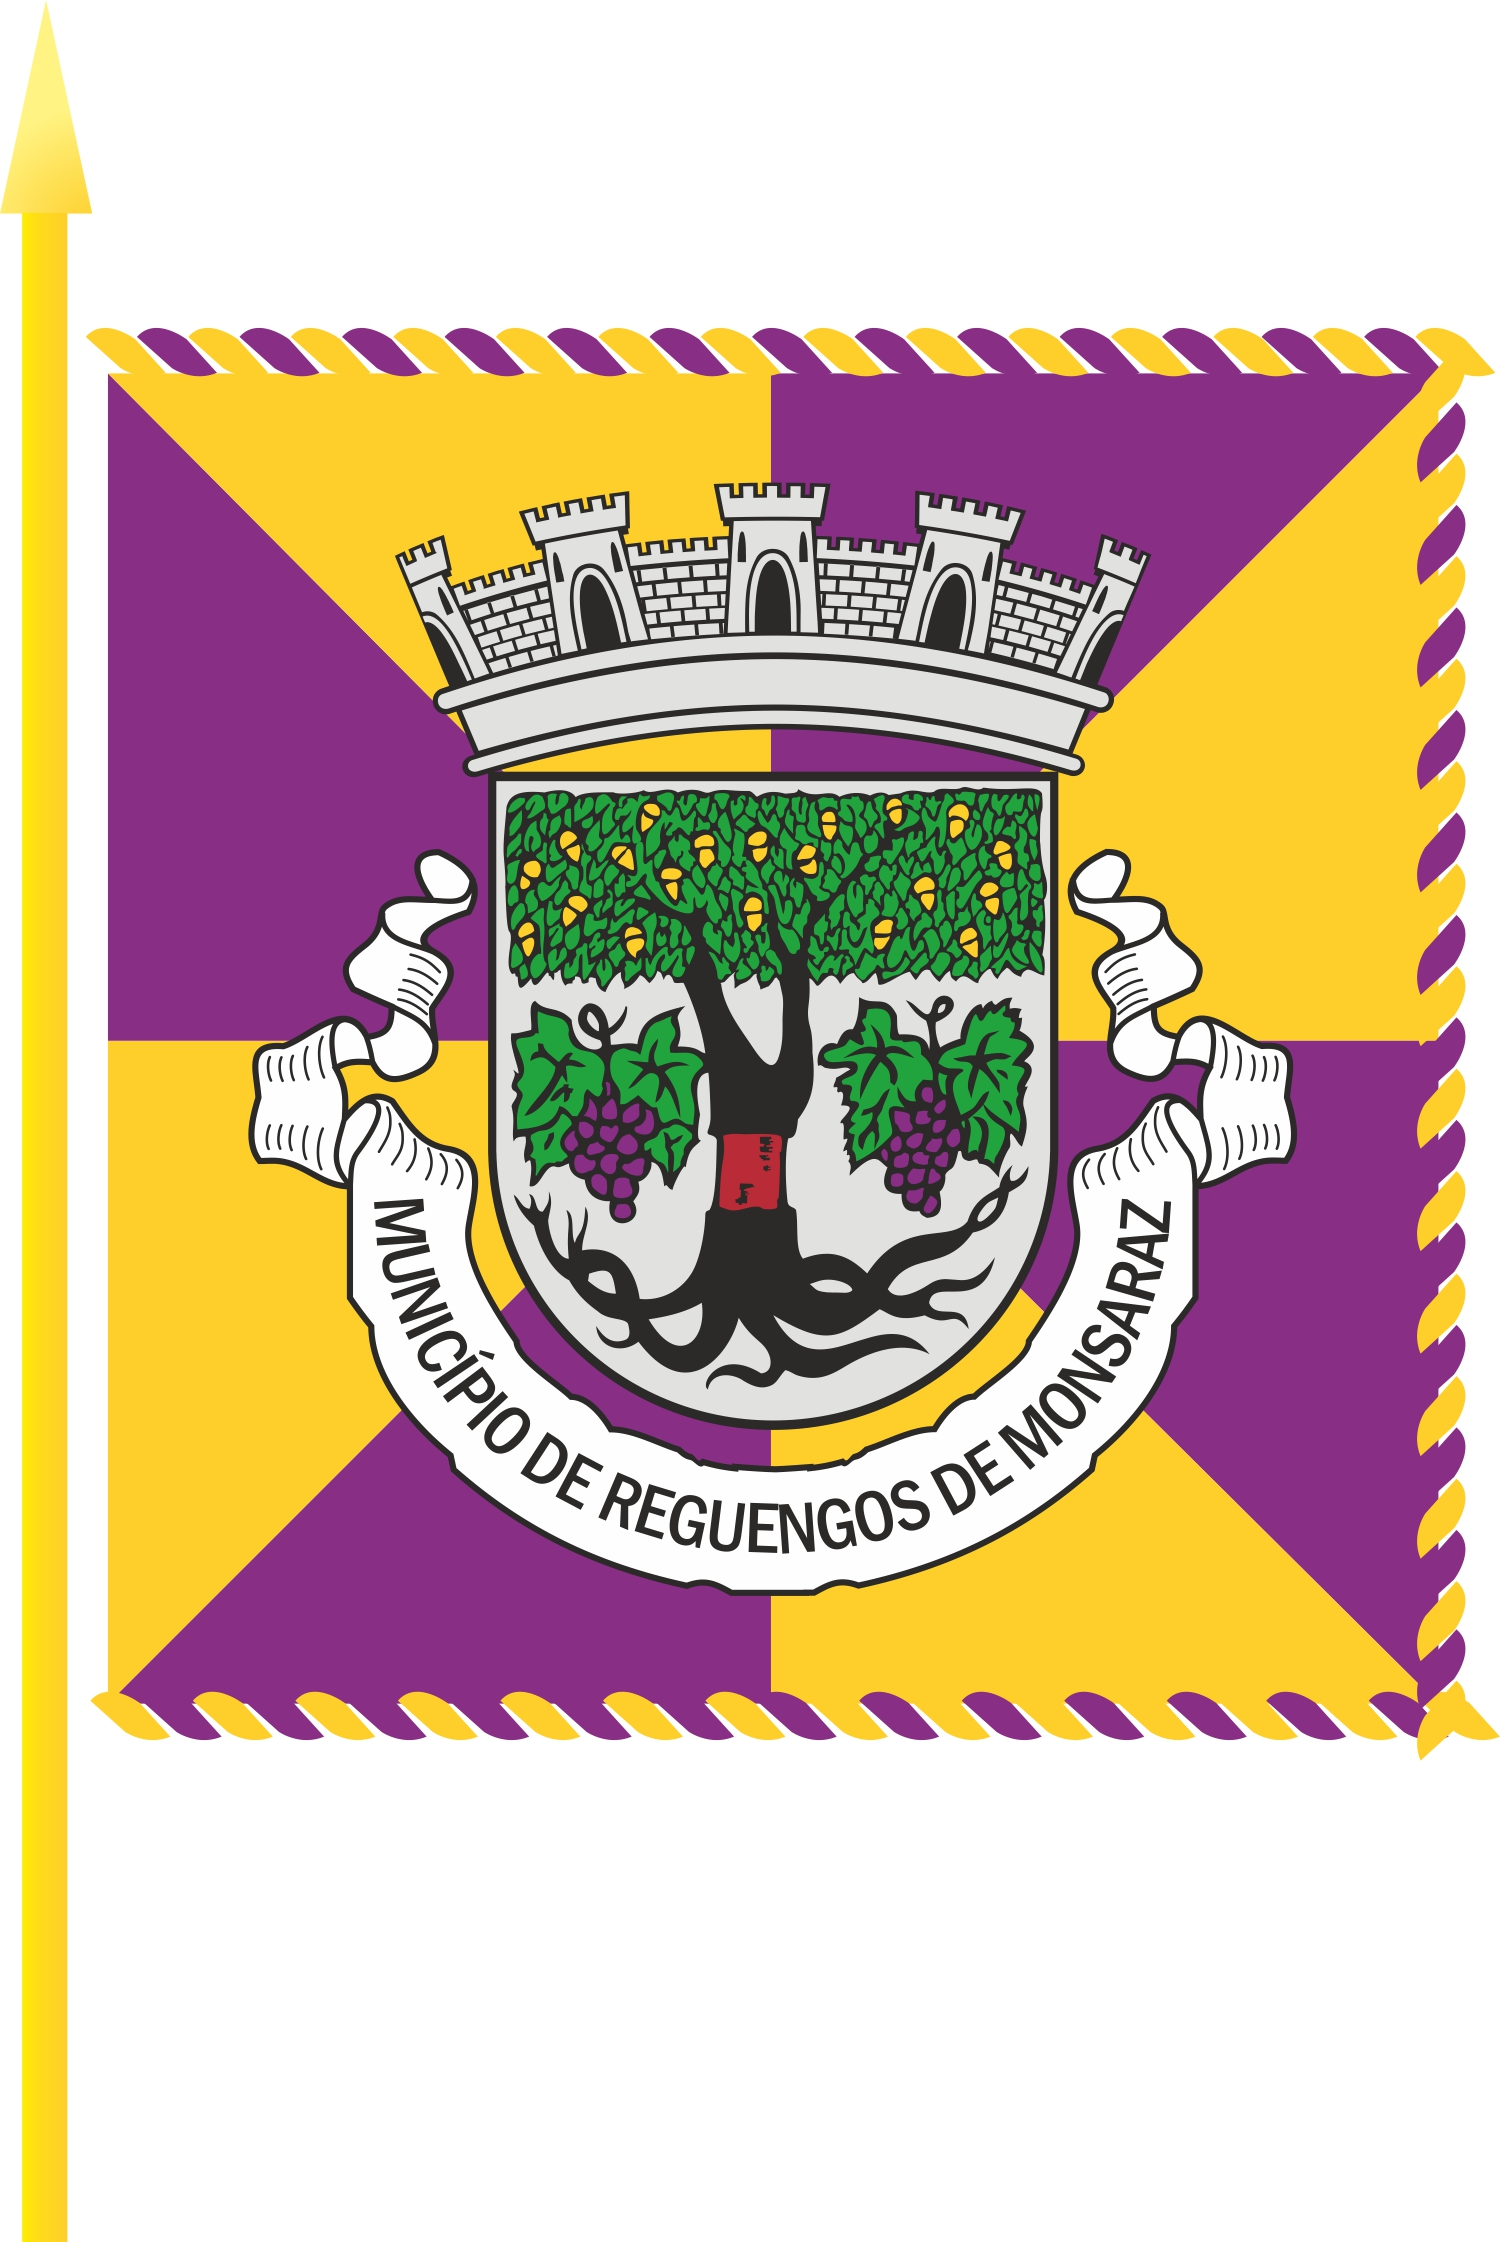 Bandeira do Município de Reguengos de Monsaraz